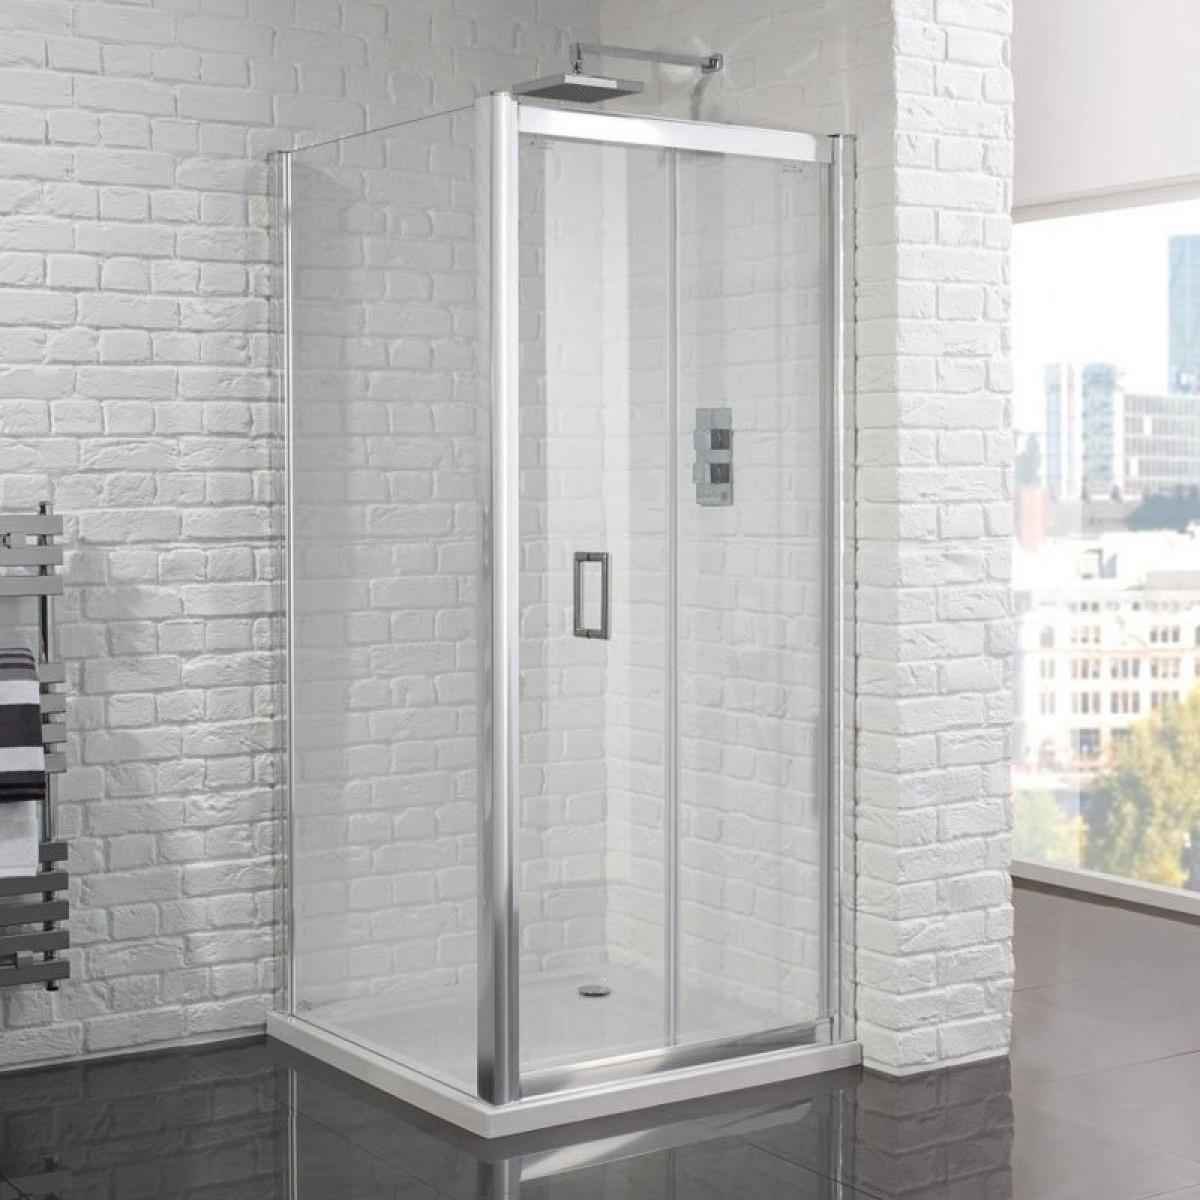 Aquadart Venturi 6 Frameless 760mm Bifold Shower Door AQ9371S -